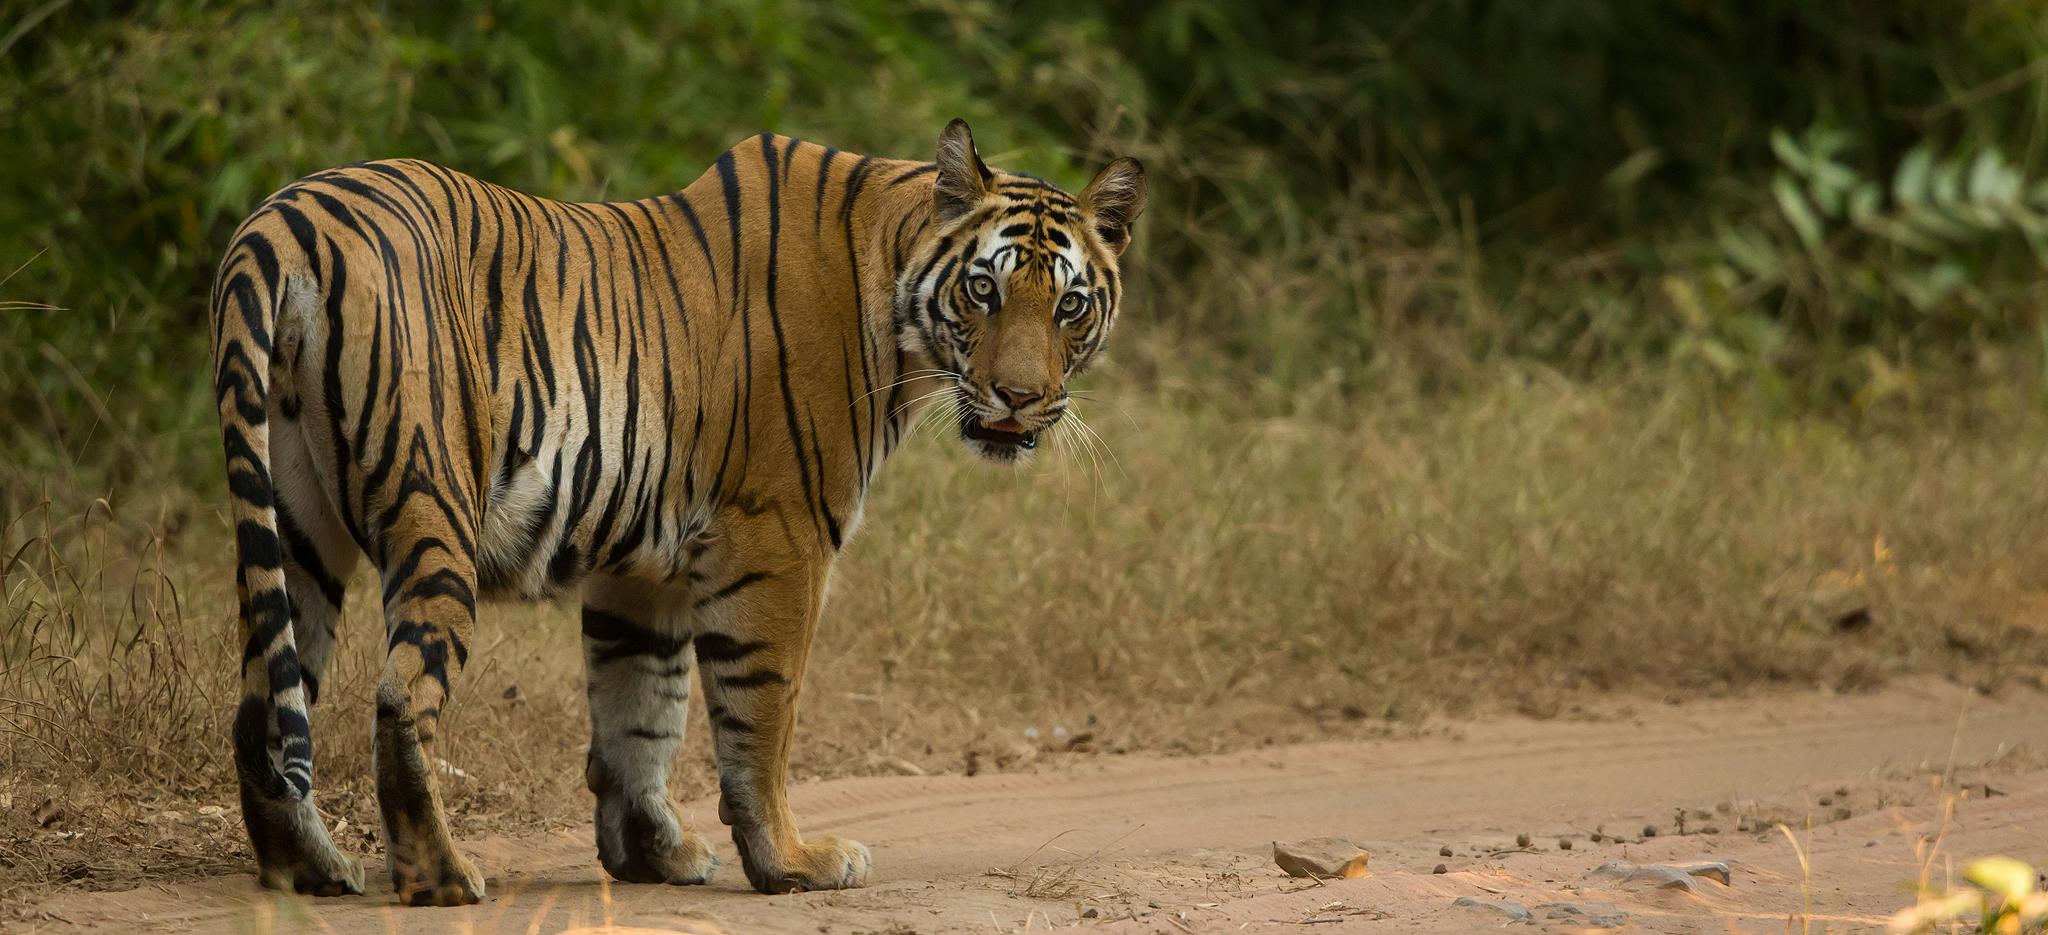 Majestic Tigers – India – 2020